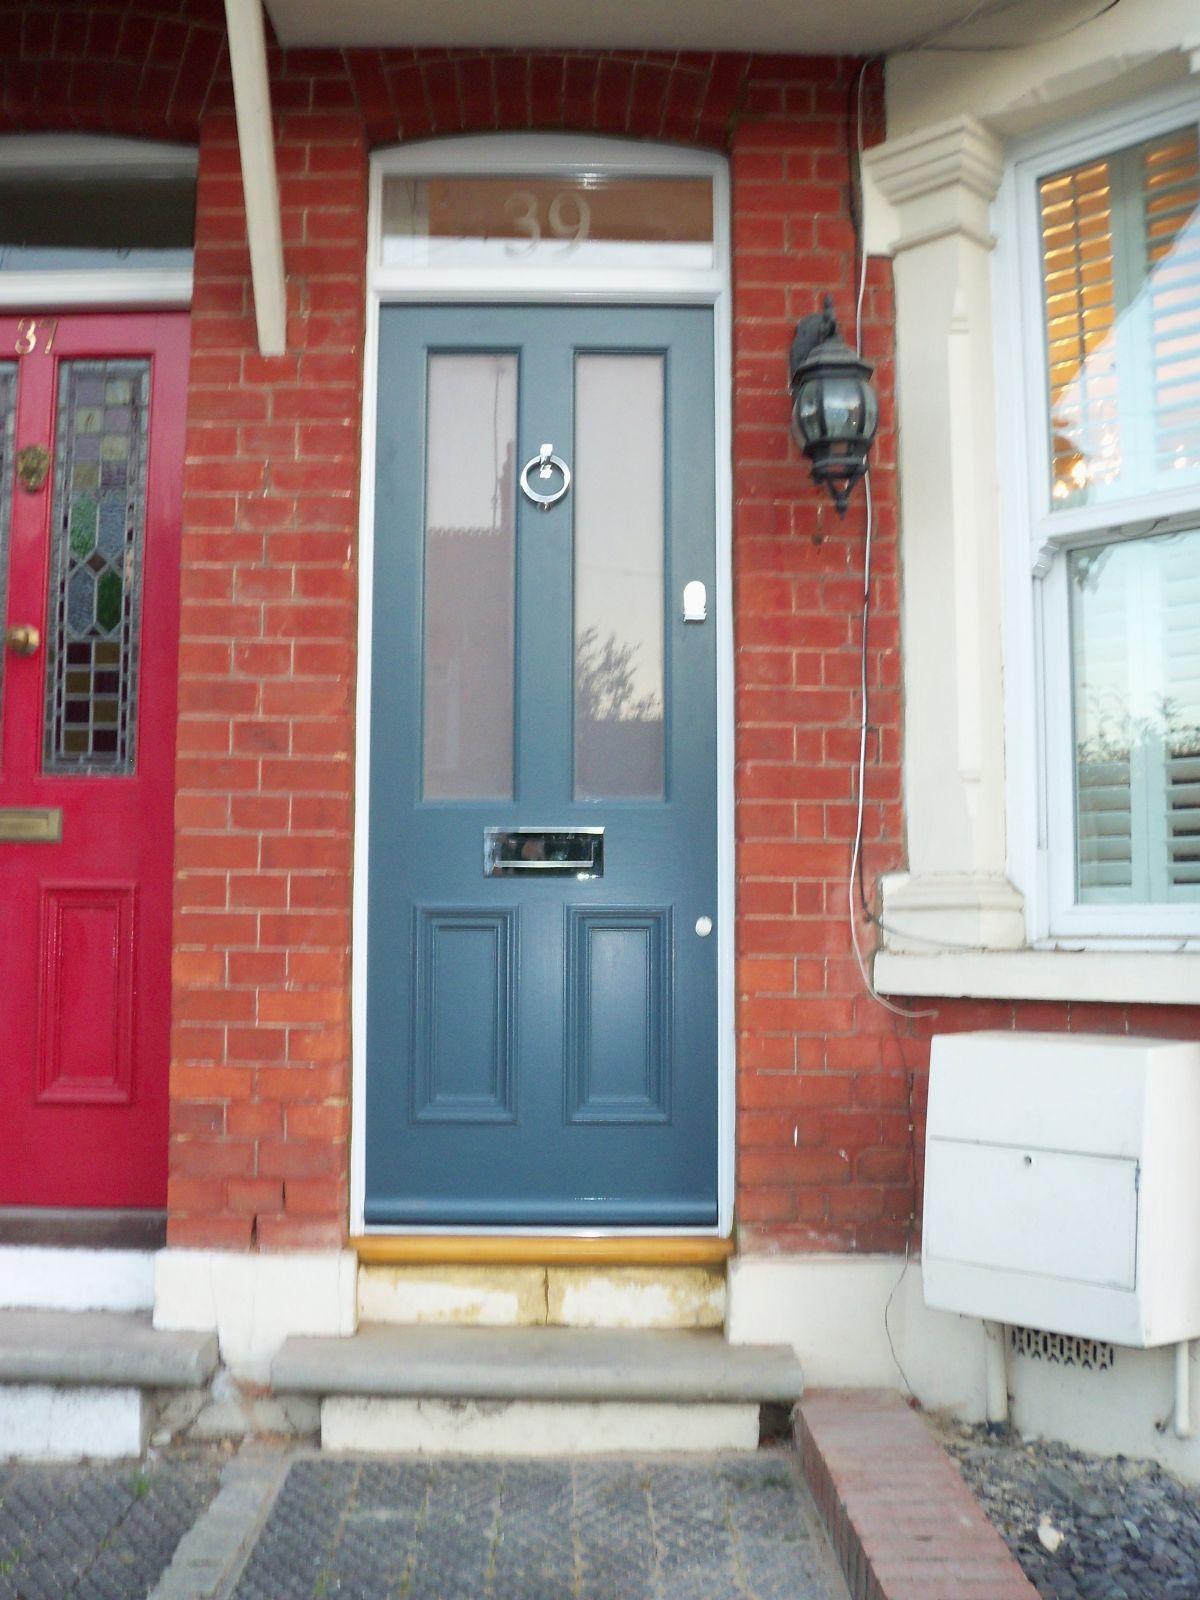 Enlarge georgian doors victorian front doors edwardian house edwardian era victorian homes